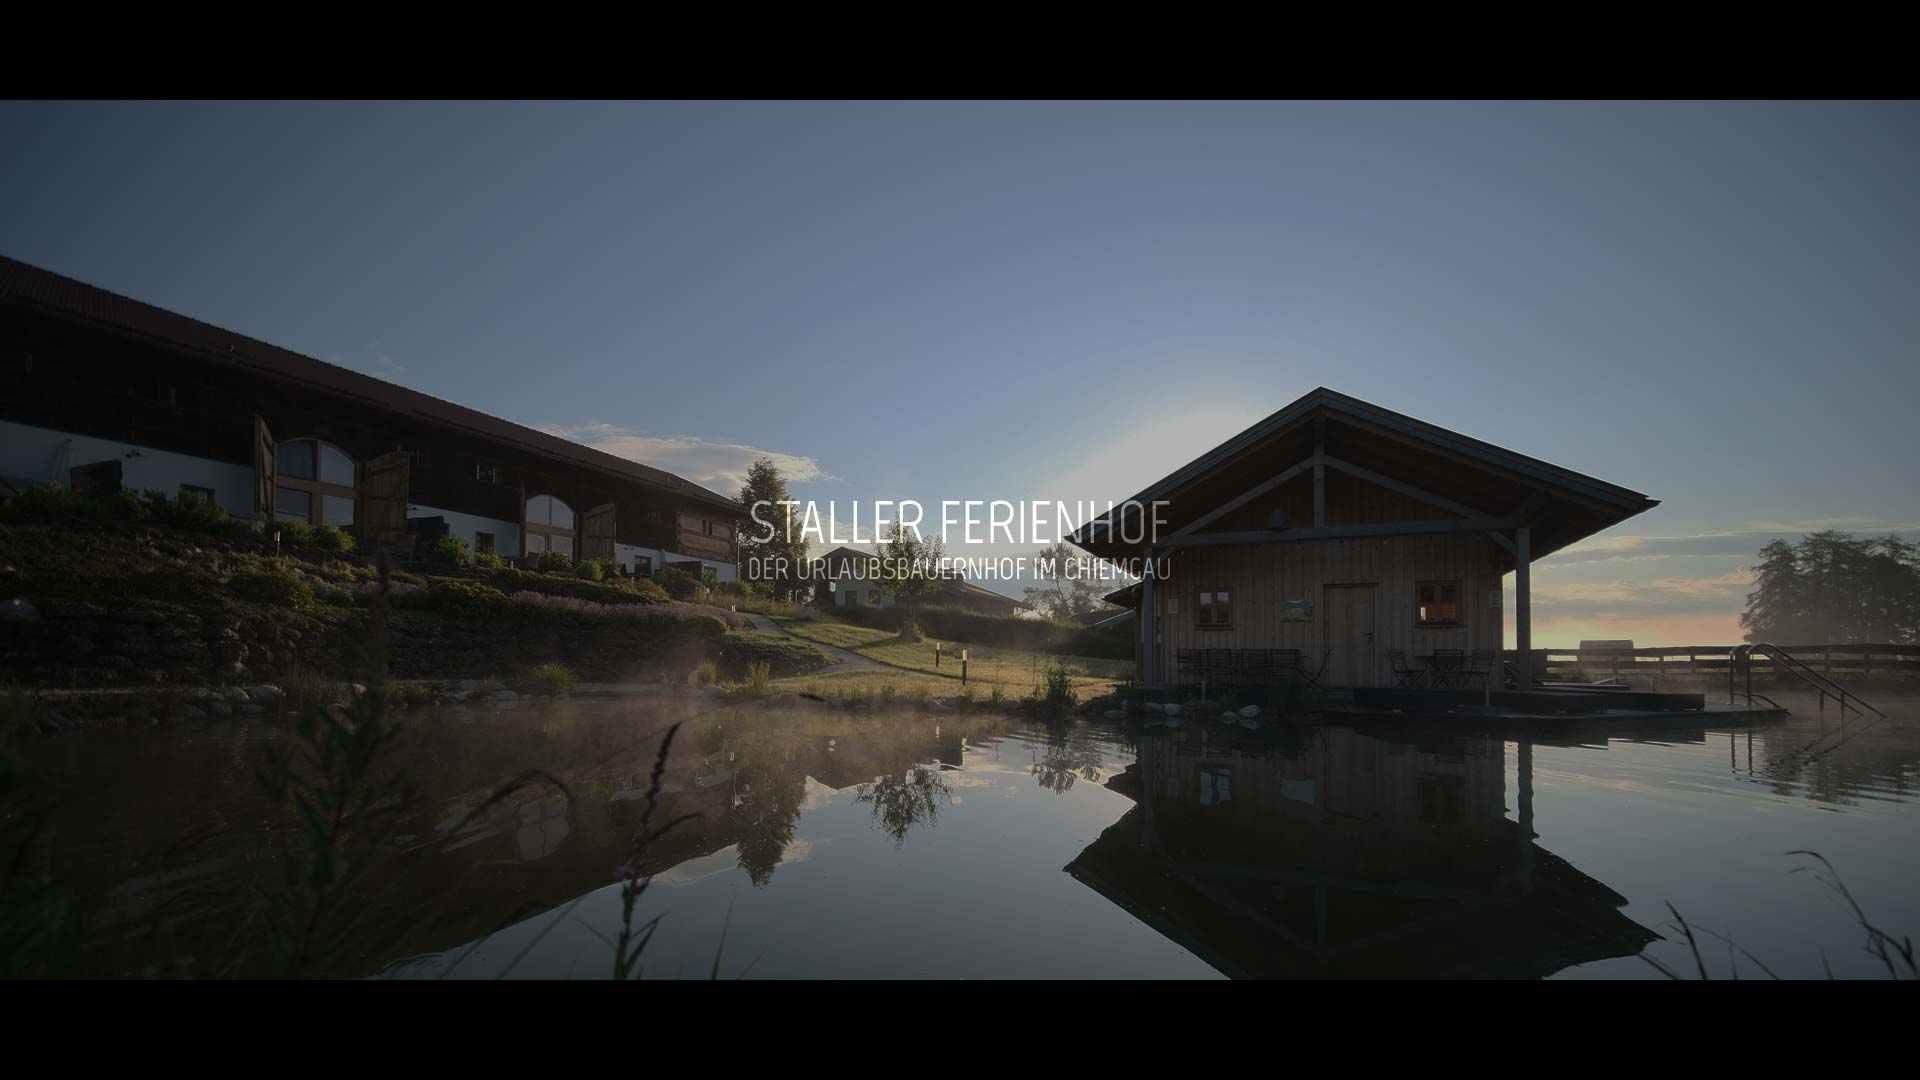 3dkad-Imagefilm-Trailer-Staller Ferienhof